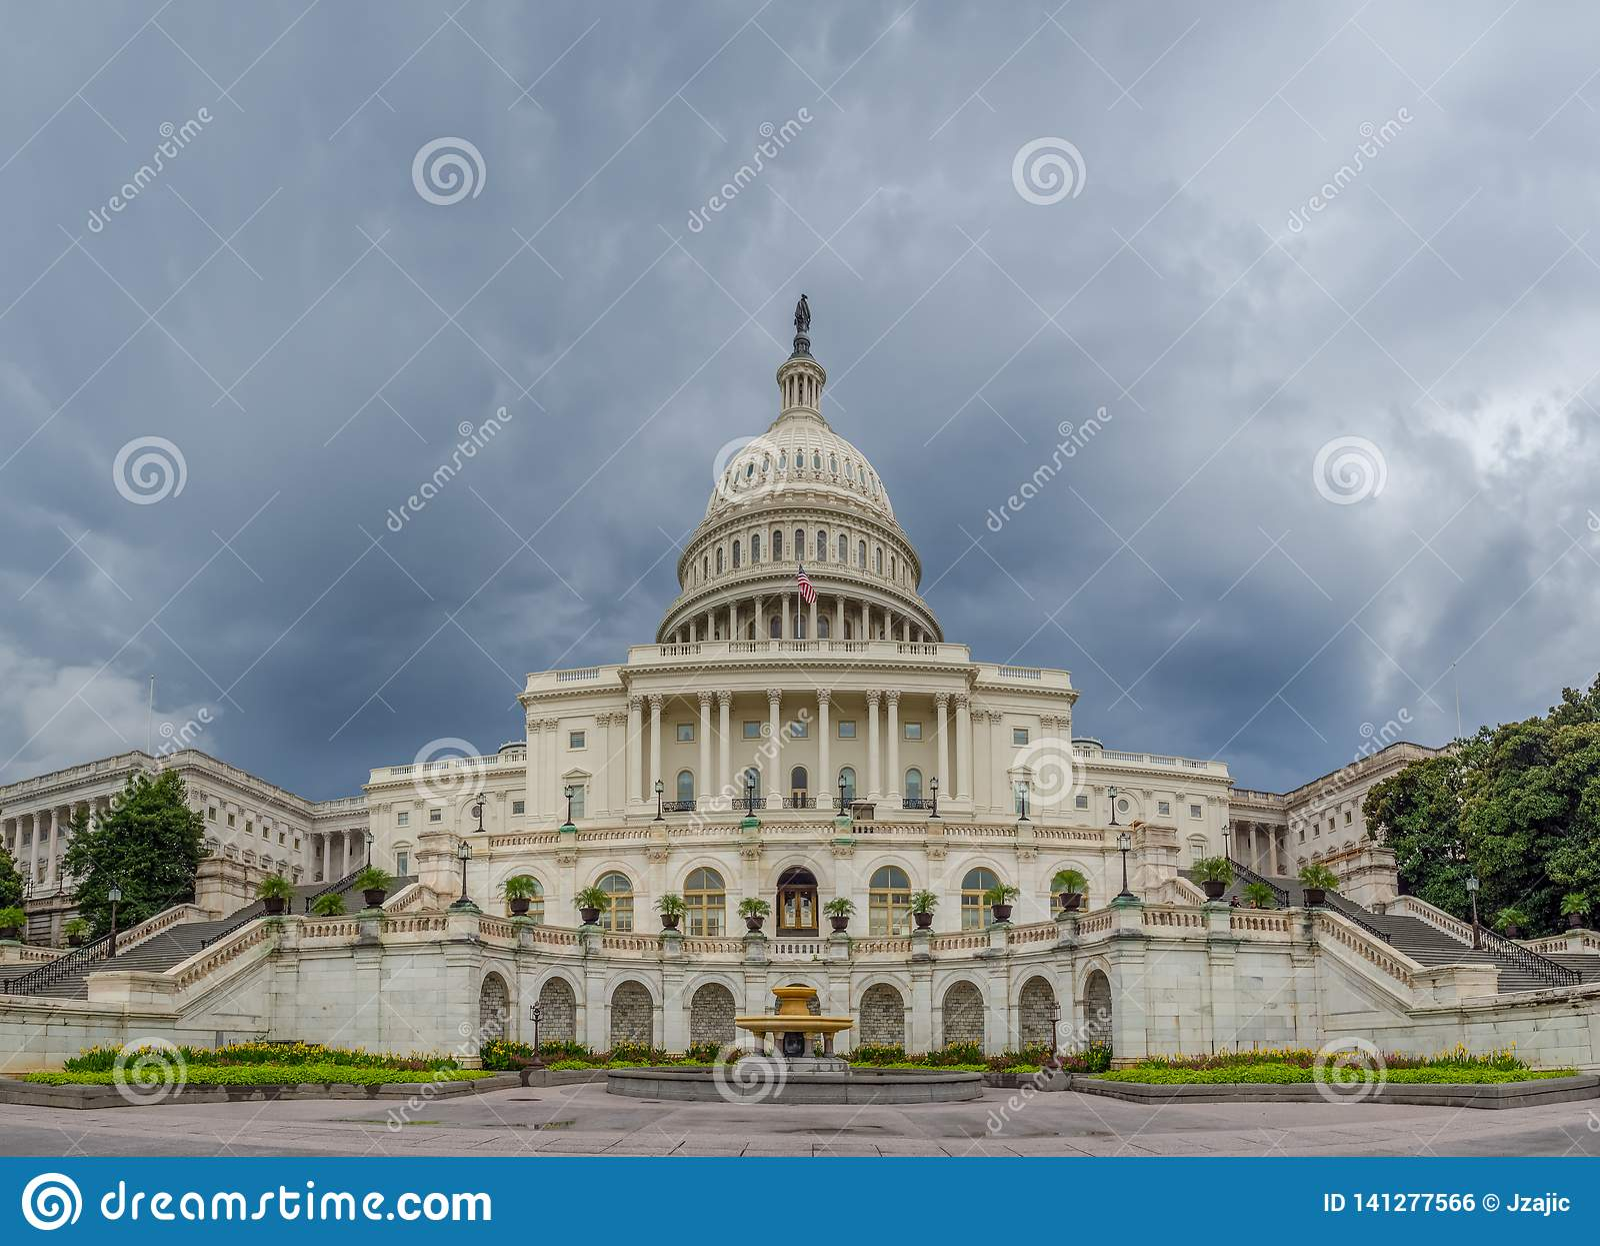 Washington DC, District Of Columbia [United States US